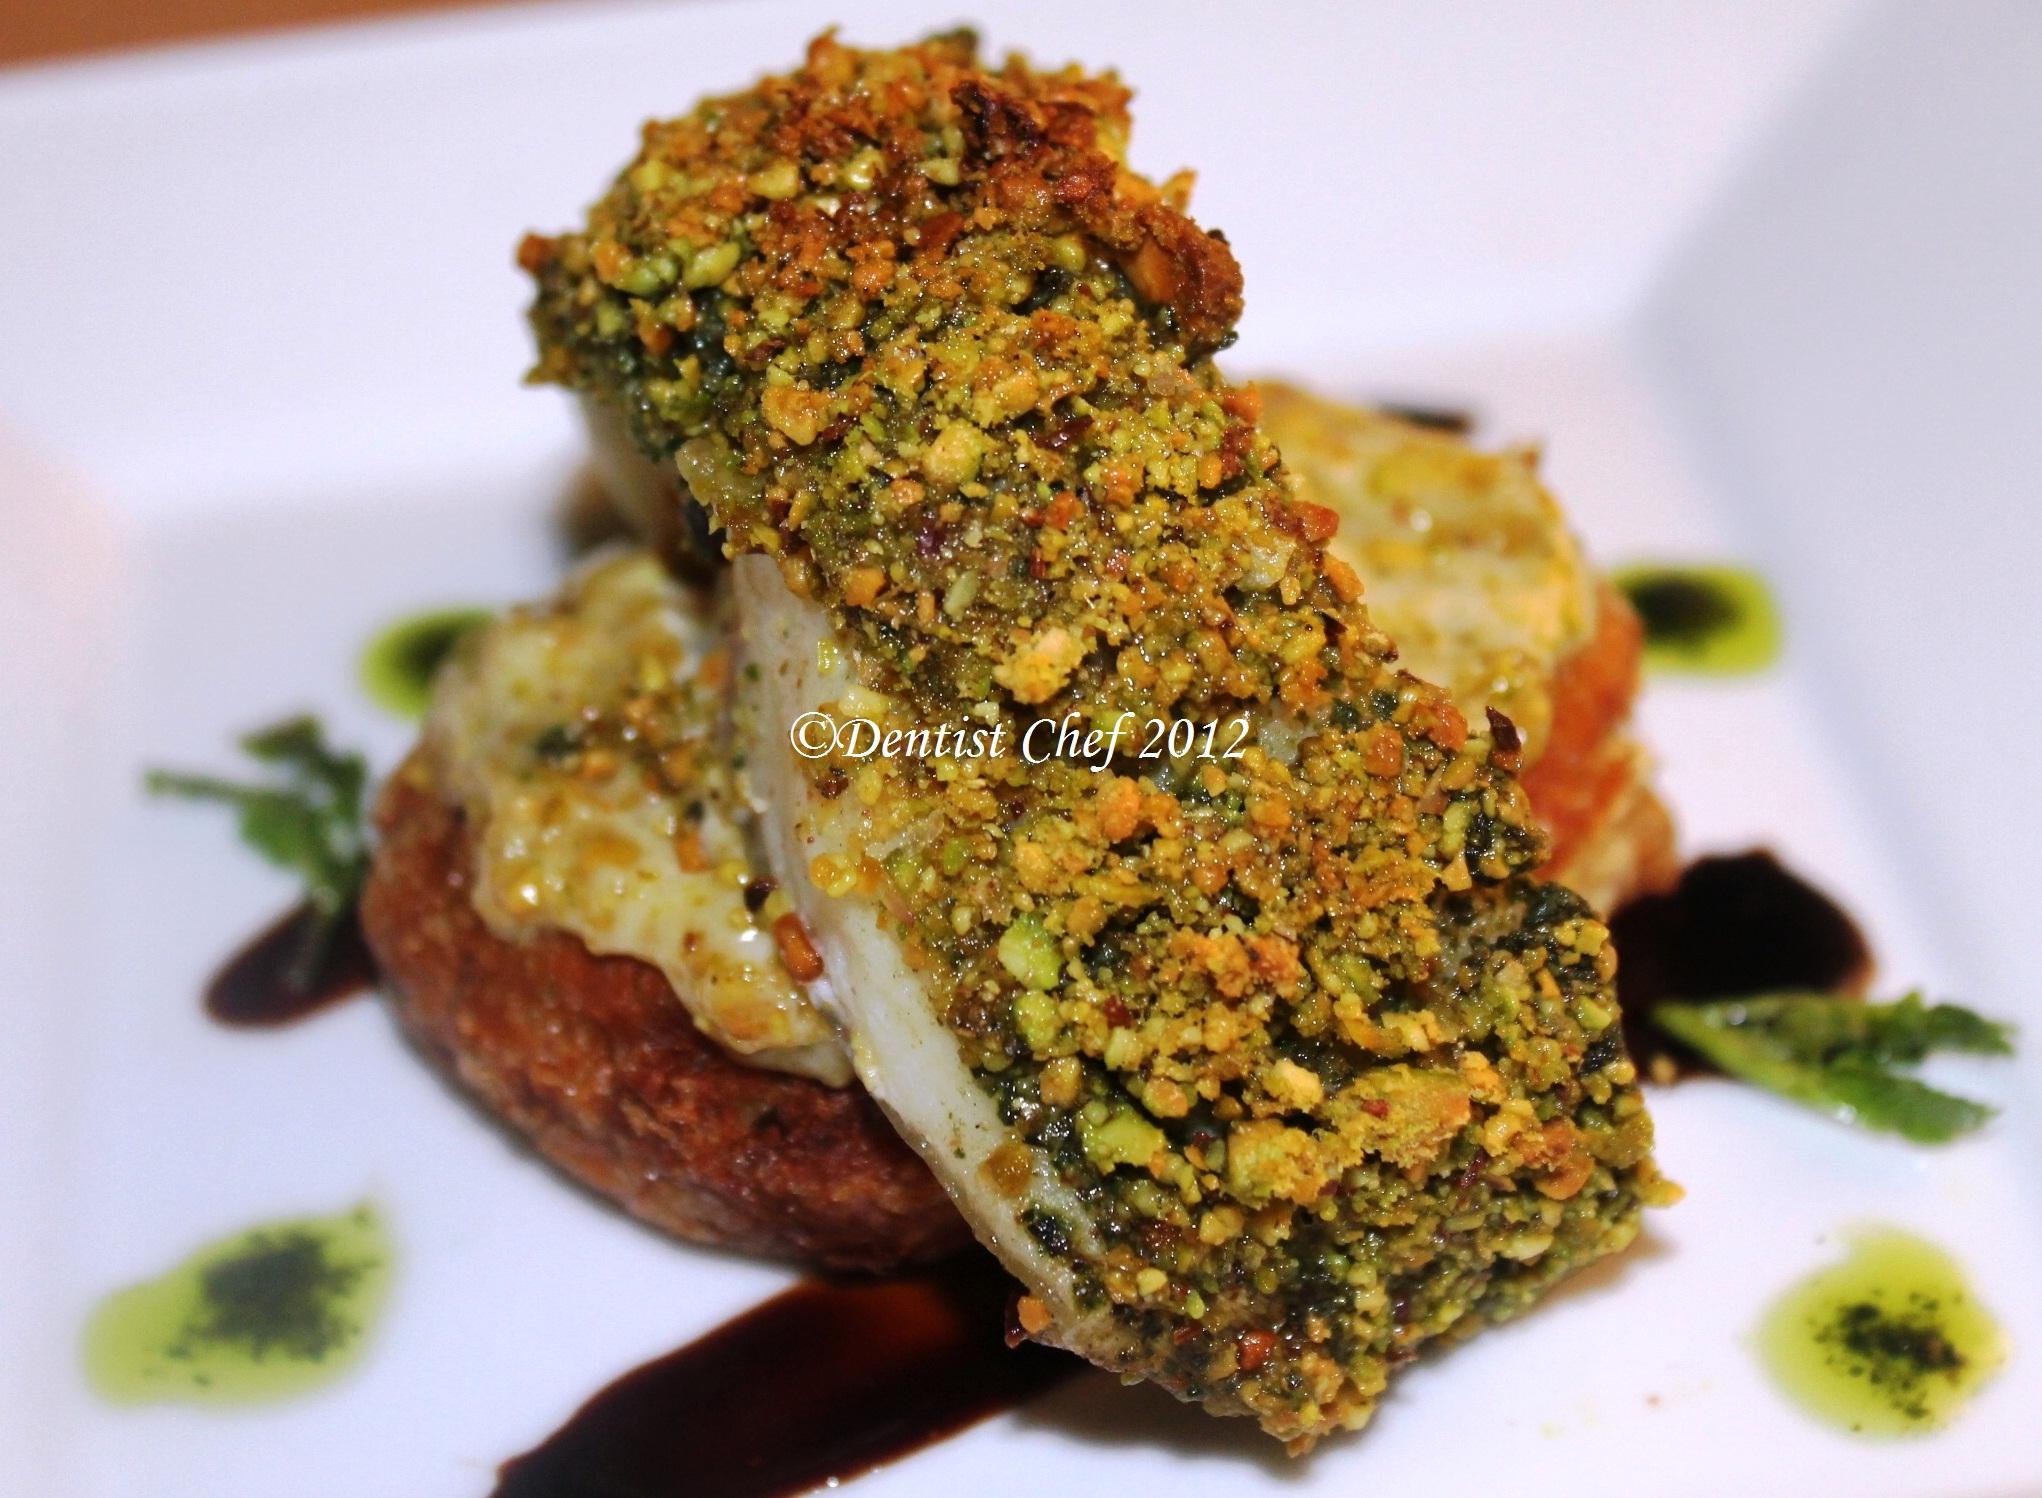 Pistachio Crusted Chilean Seabass Fish Fillet ala Dentist Chef